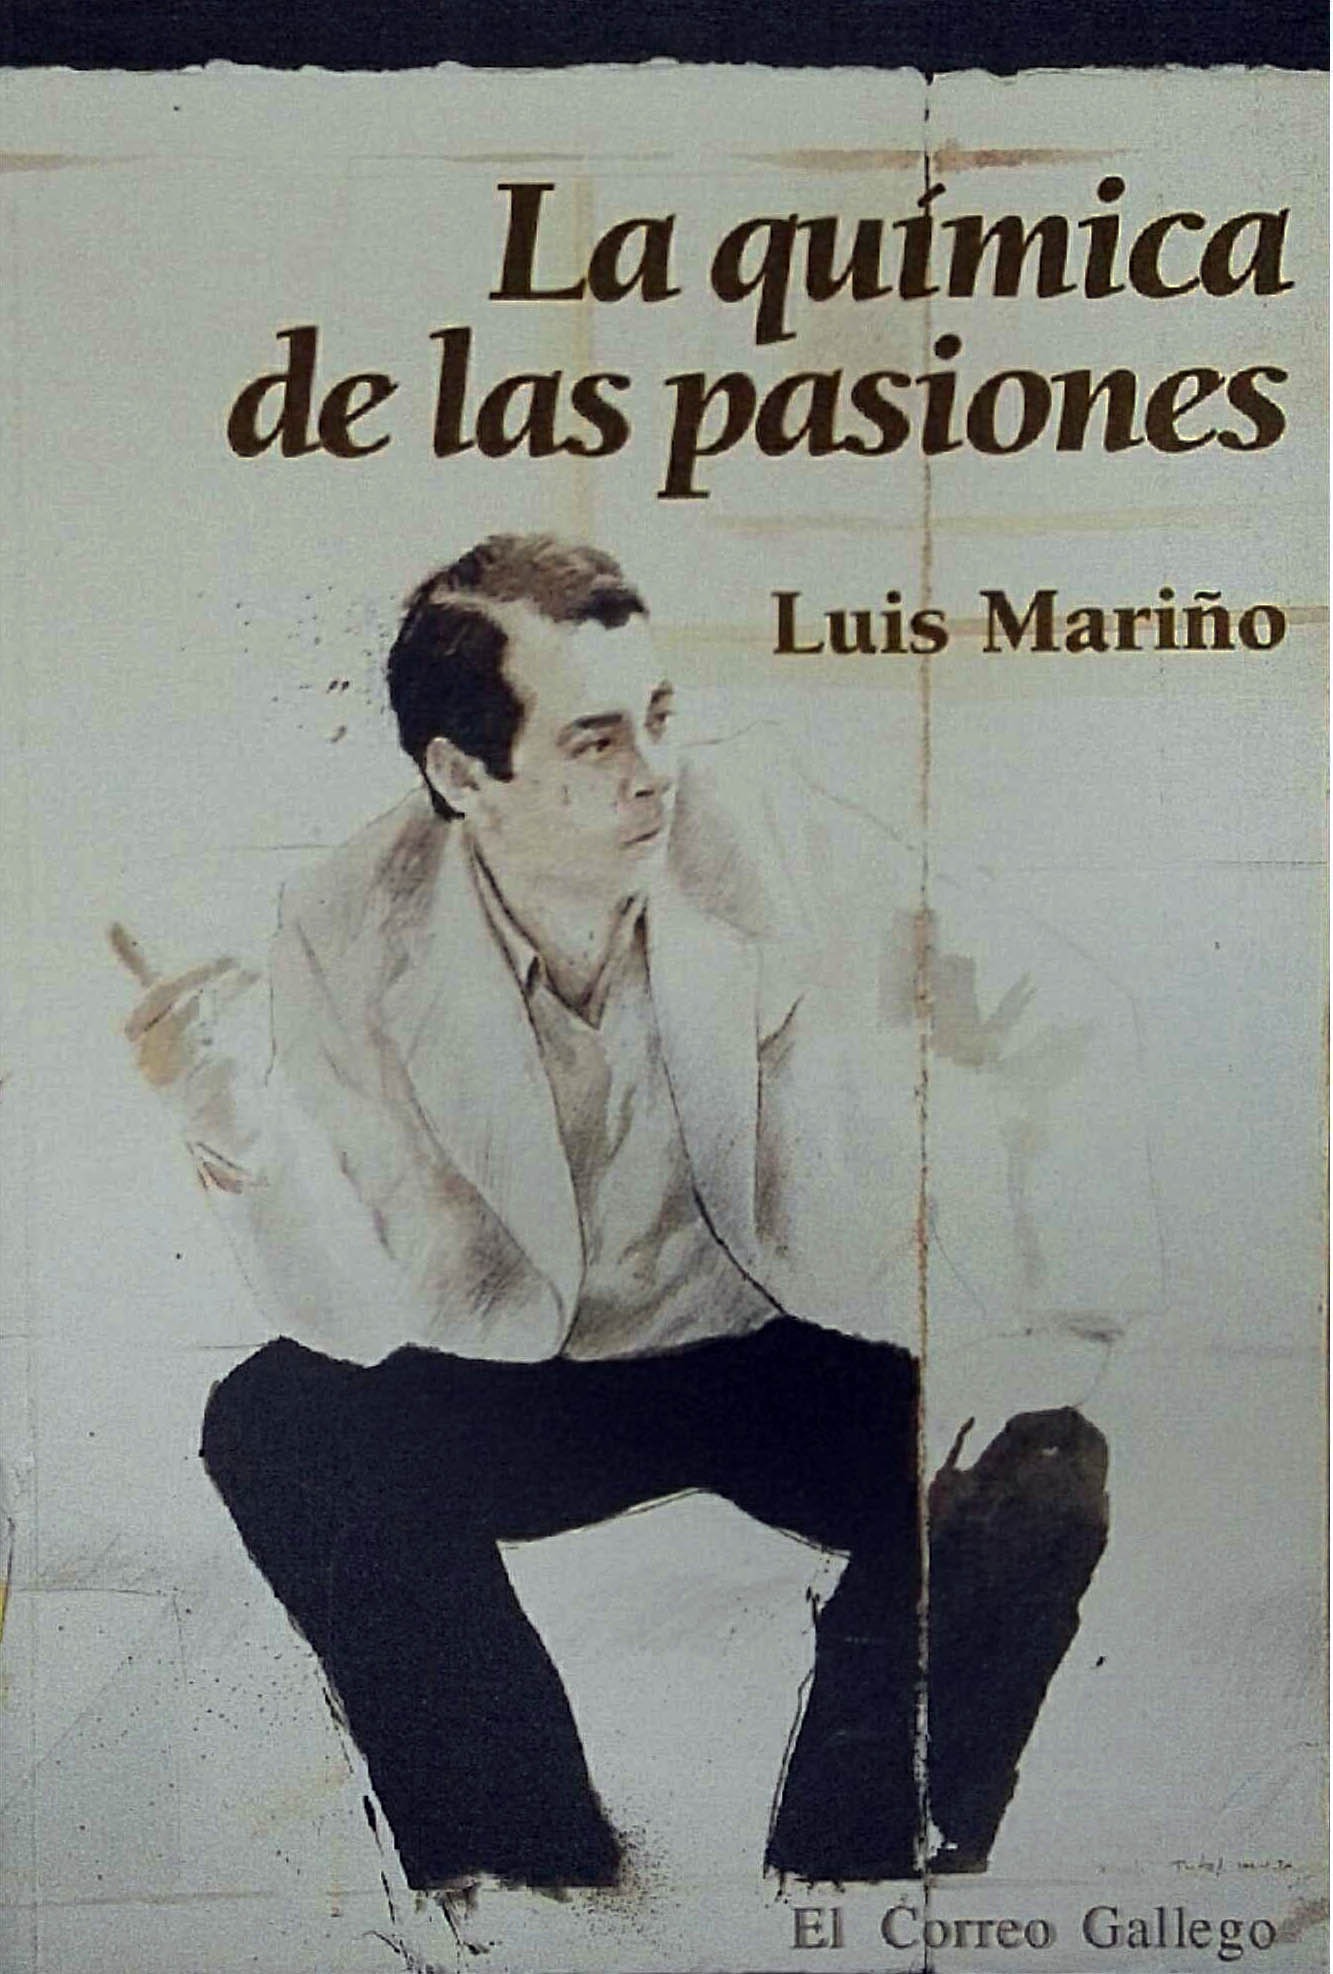 ilustración de Quintana Martelo.